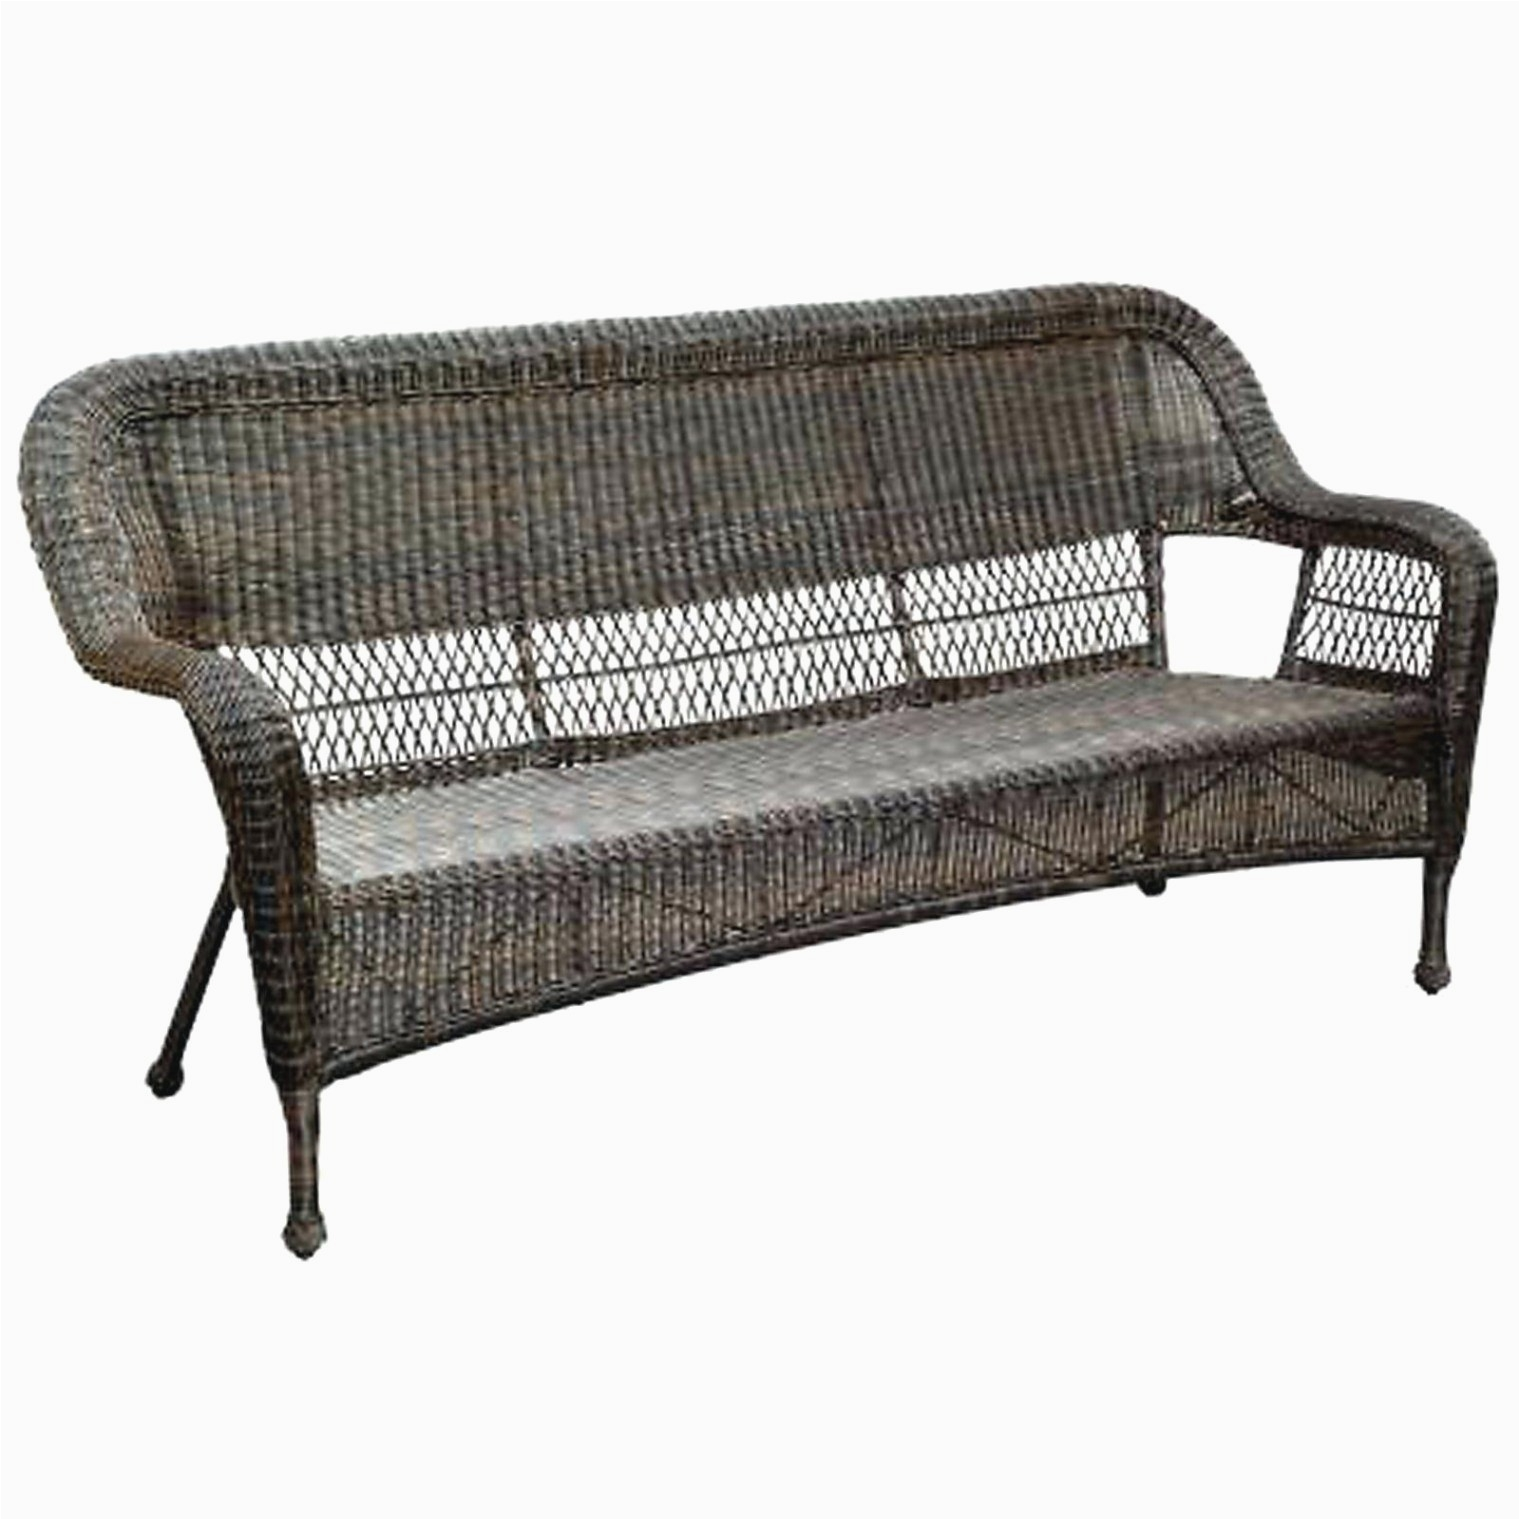 patio swing cushions beautiful patio recliners new luxuria¶s wicker outdoor sofa 0d patio chairs patio 42 stunning fred meyer